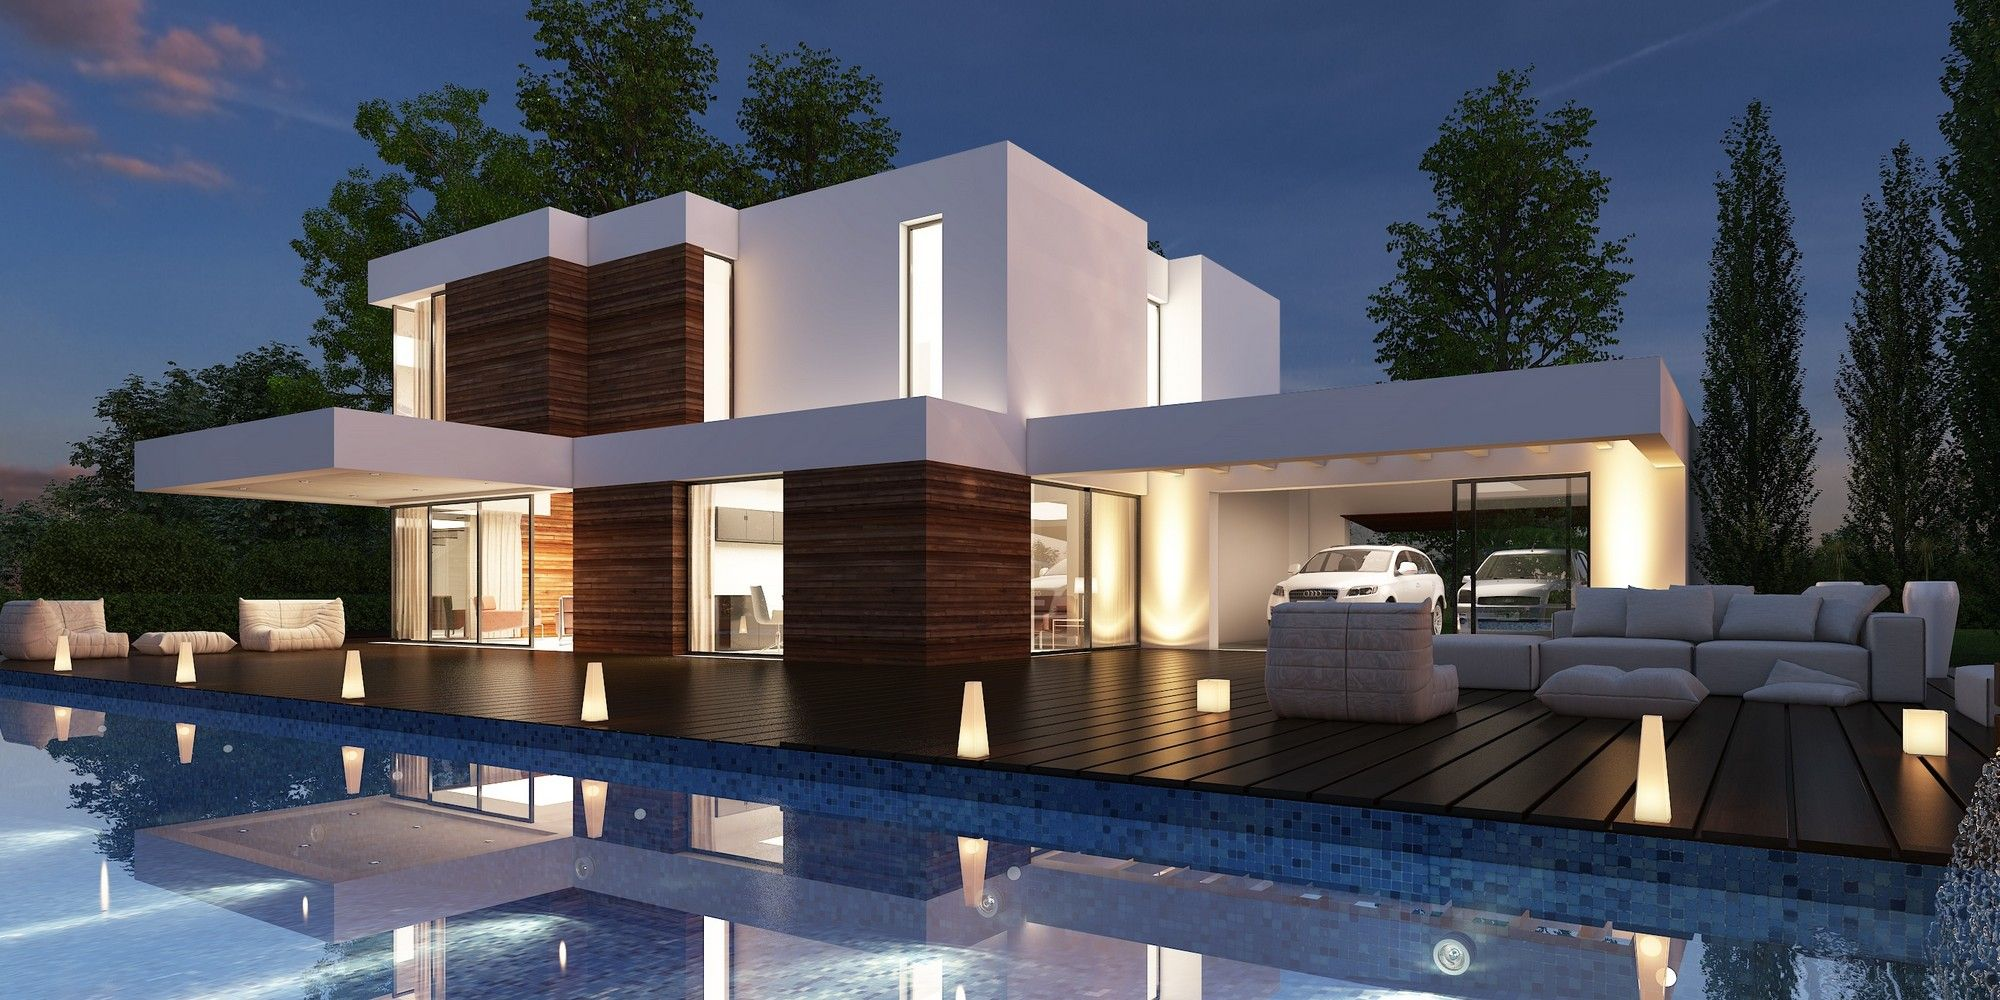 Casas modernas planos proyectos y construccion de casas for Casa moderna 8